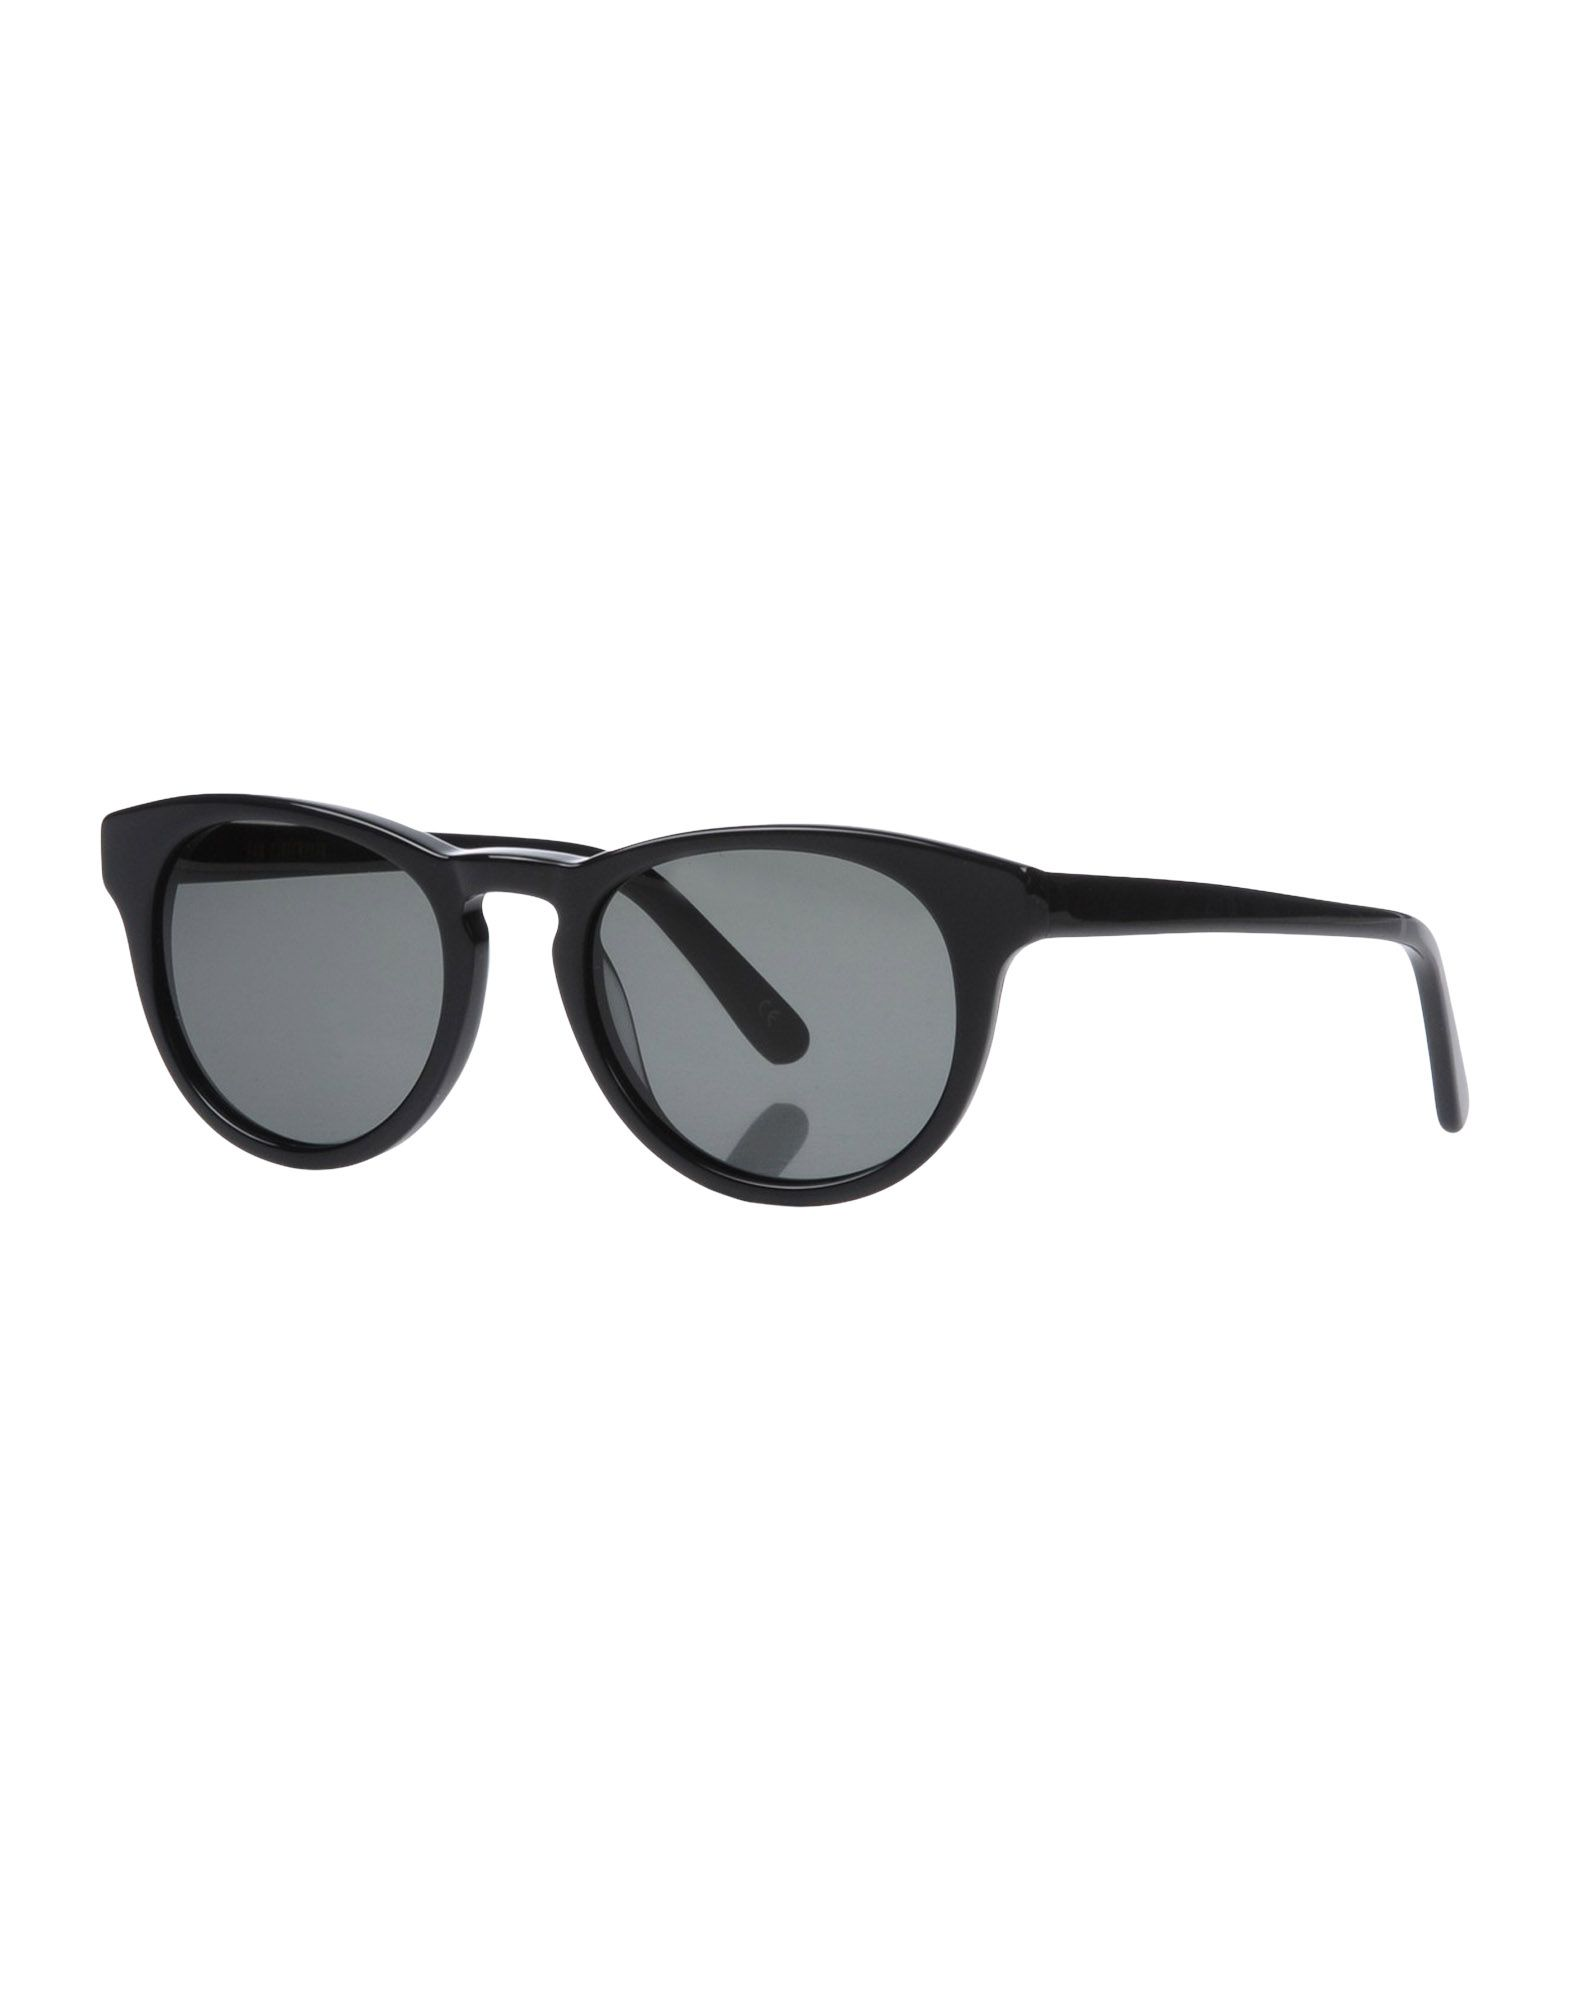 HAN KJØBENHAVN Солнечные очки web eyewear солнечные очки